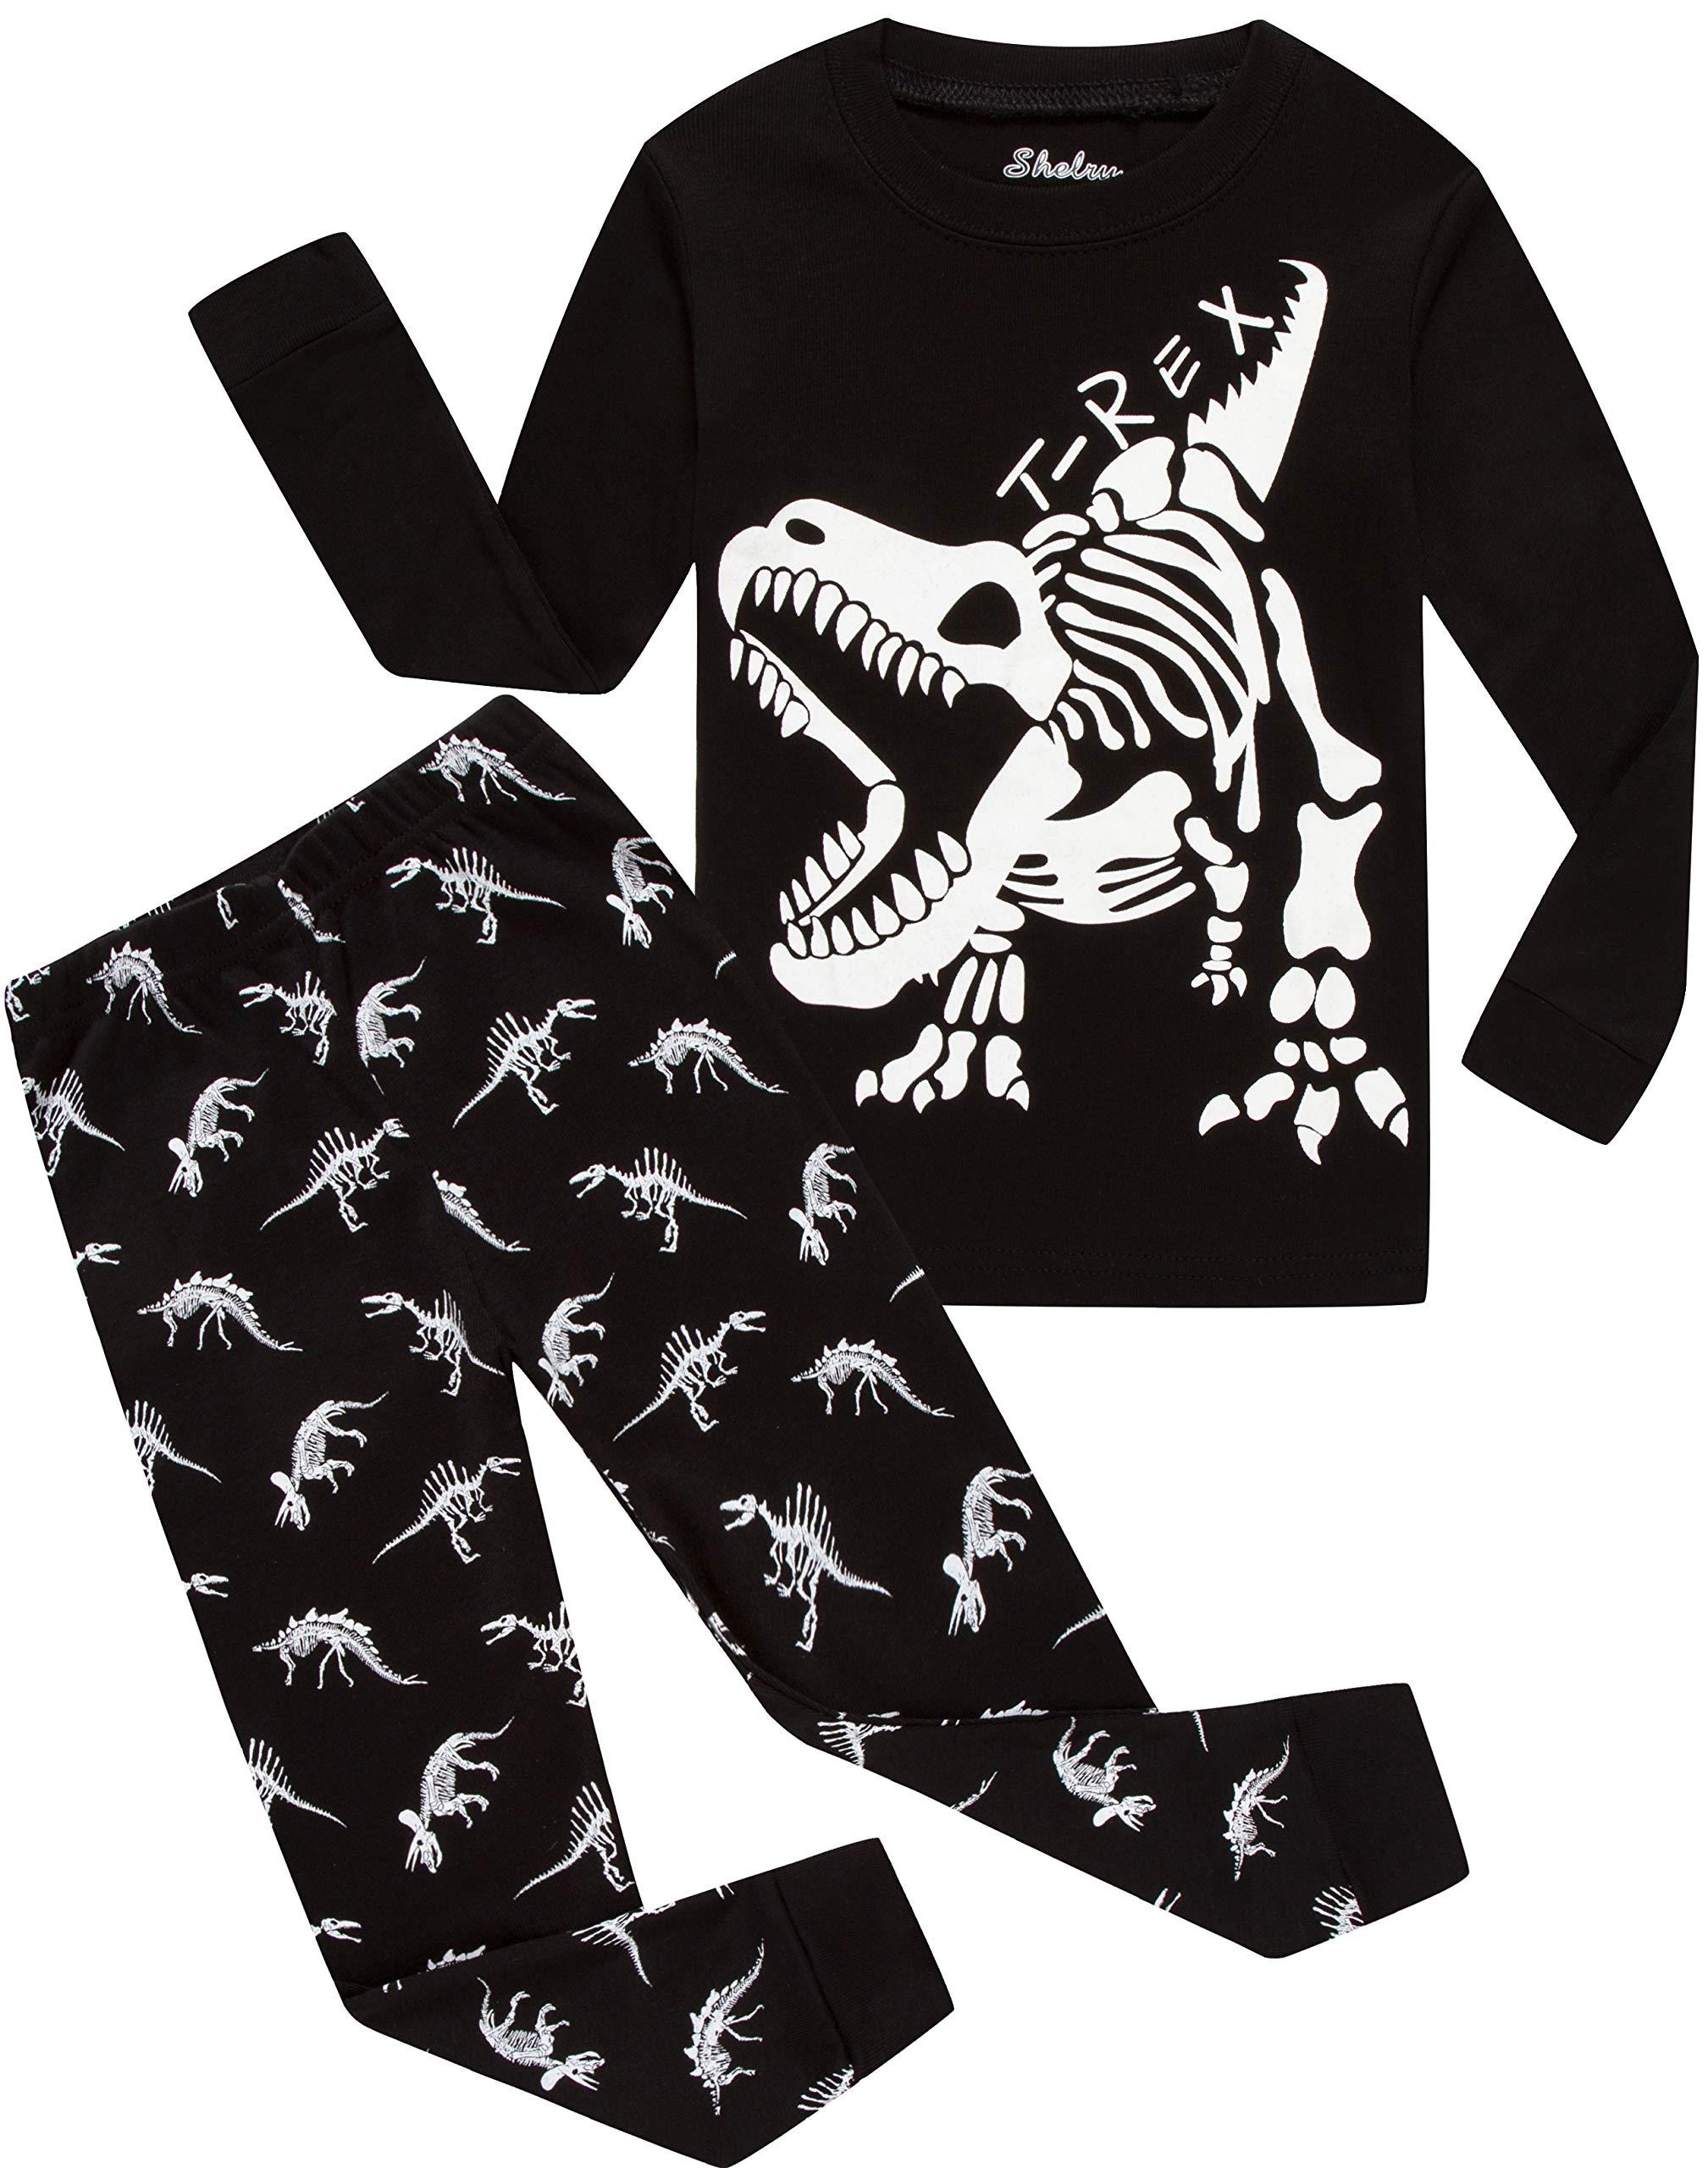 Boys Pajamas Long Sleeves Toddler Clothes White Dinosaurs Kids Pjs Sleepwear